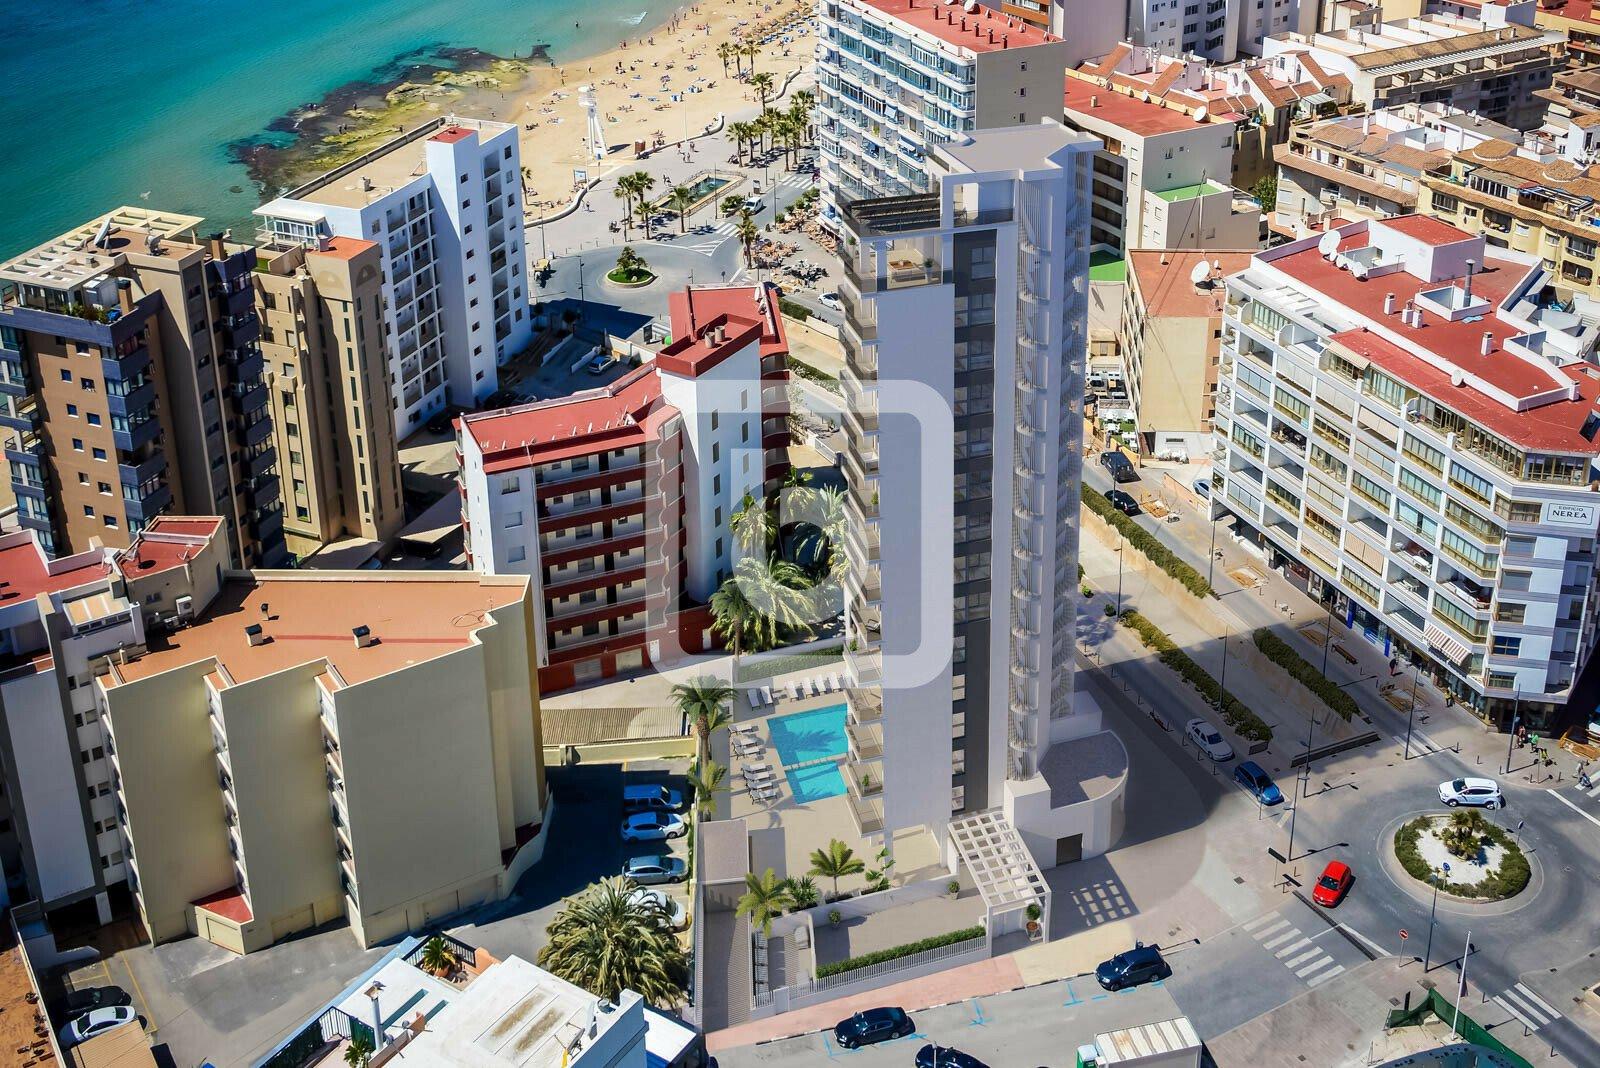 Appartamento a Calp, Comunità Valenzana, Spagna 1 - 11438914